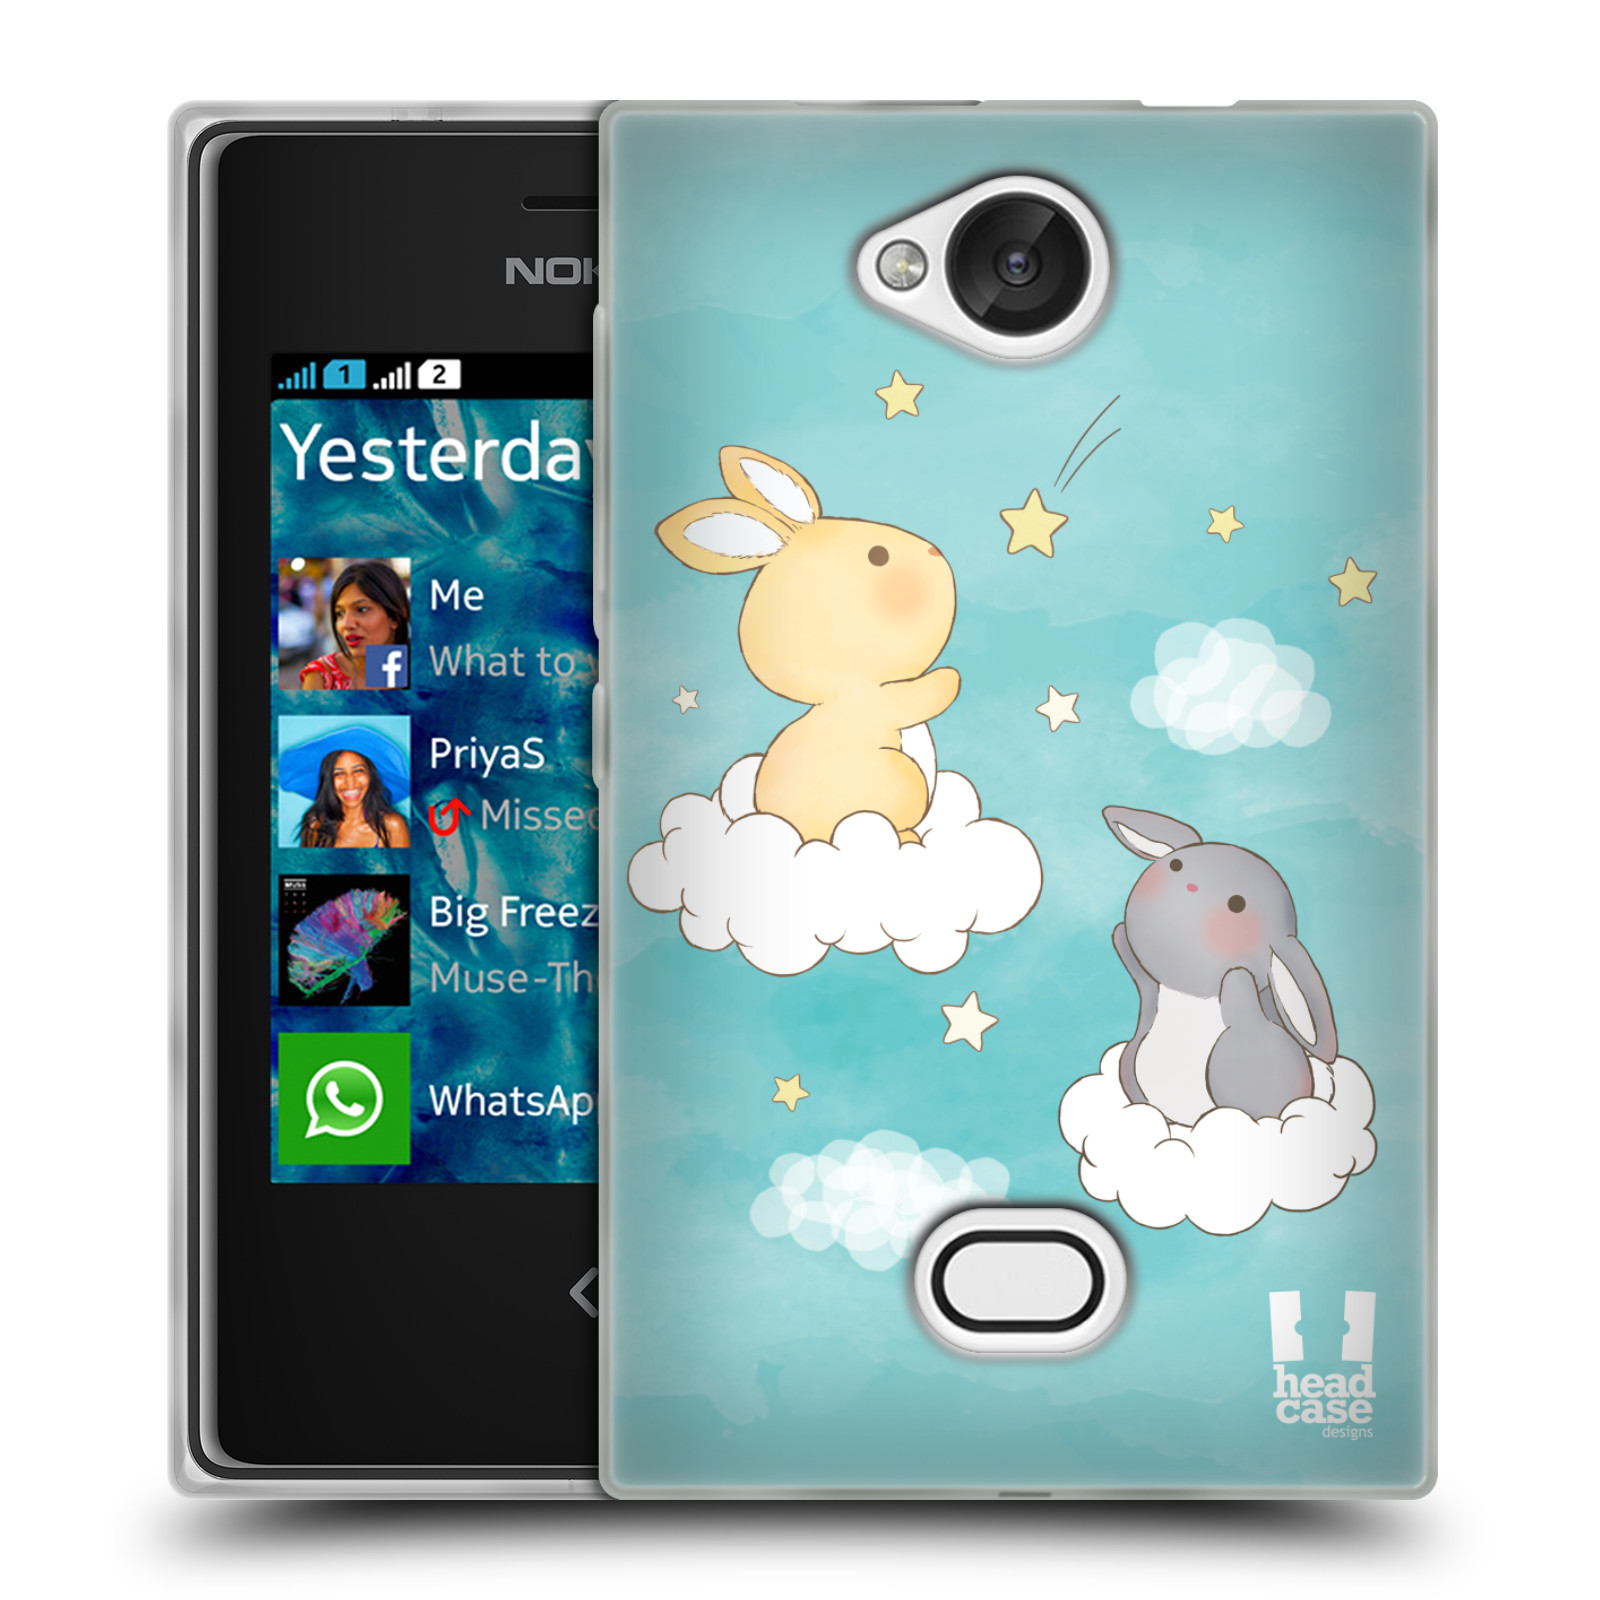 HEAD CASE silikonový obal na mobil NOKIA Asha 503 vzor králíček a hvězdy modrá